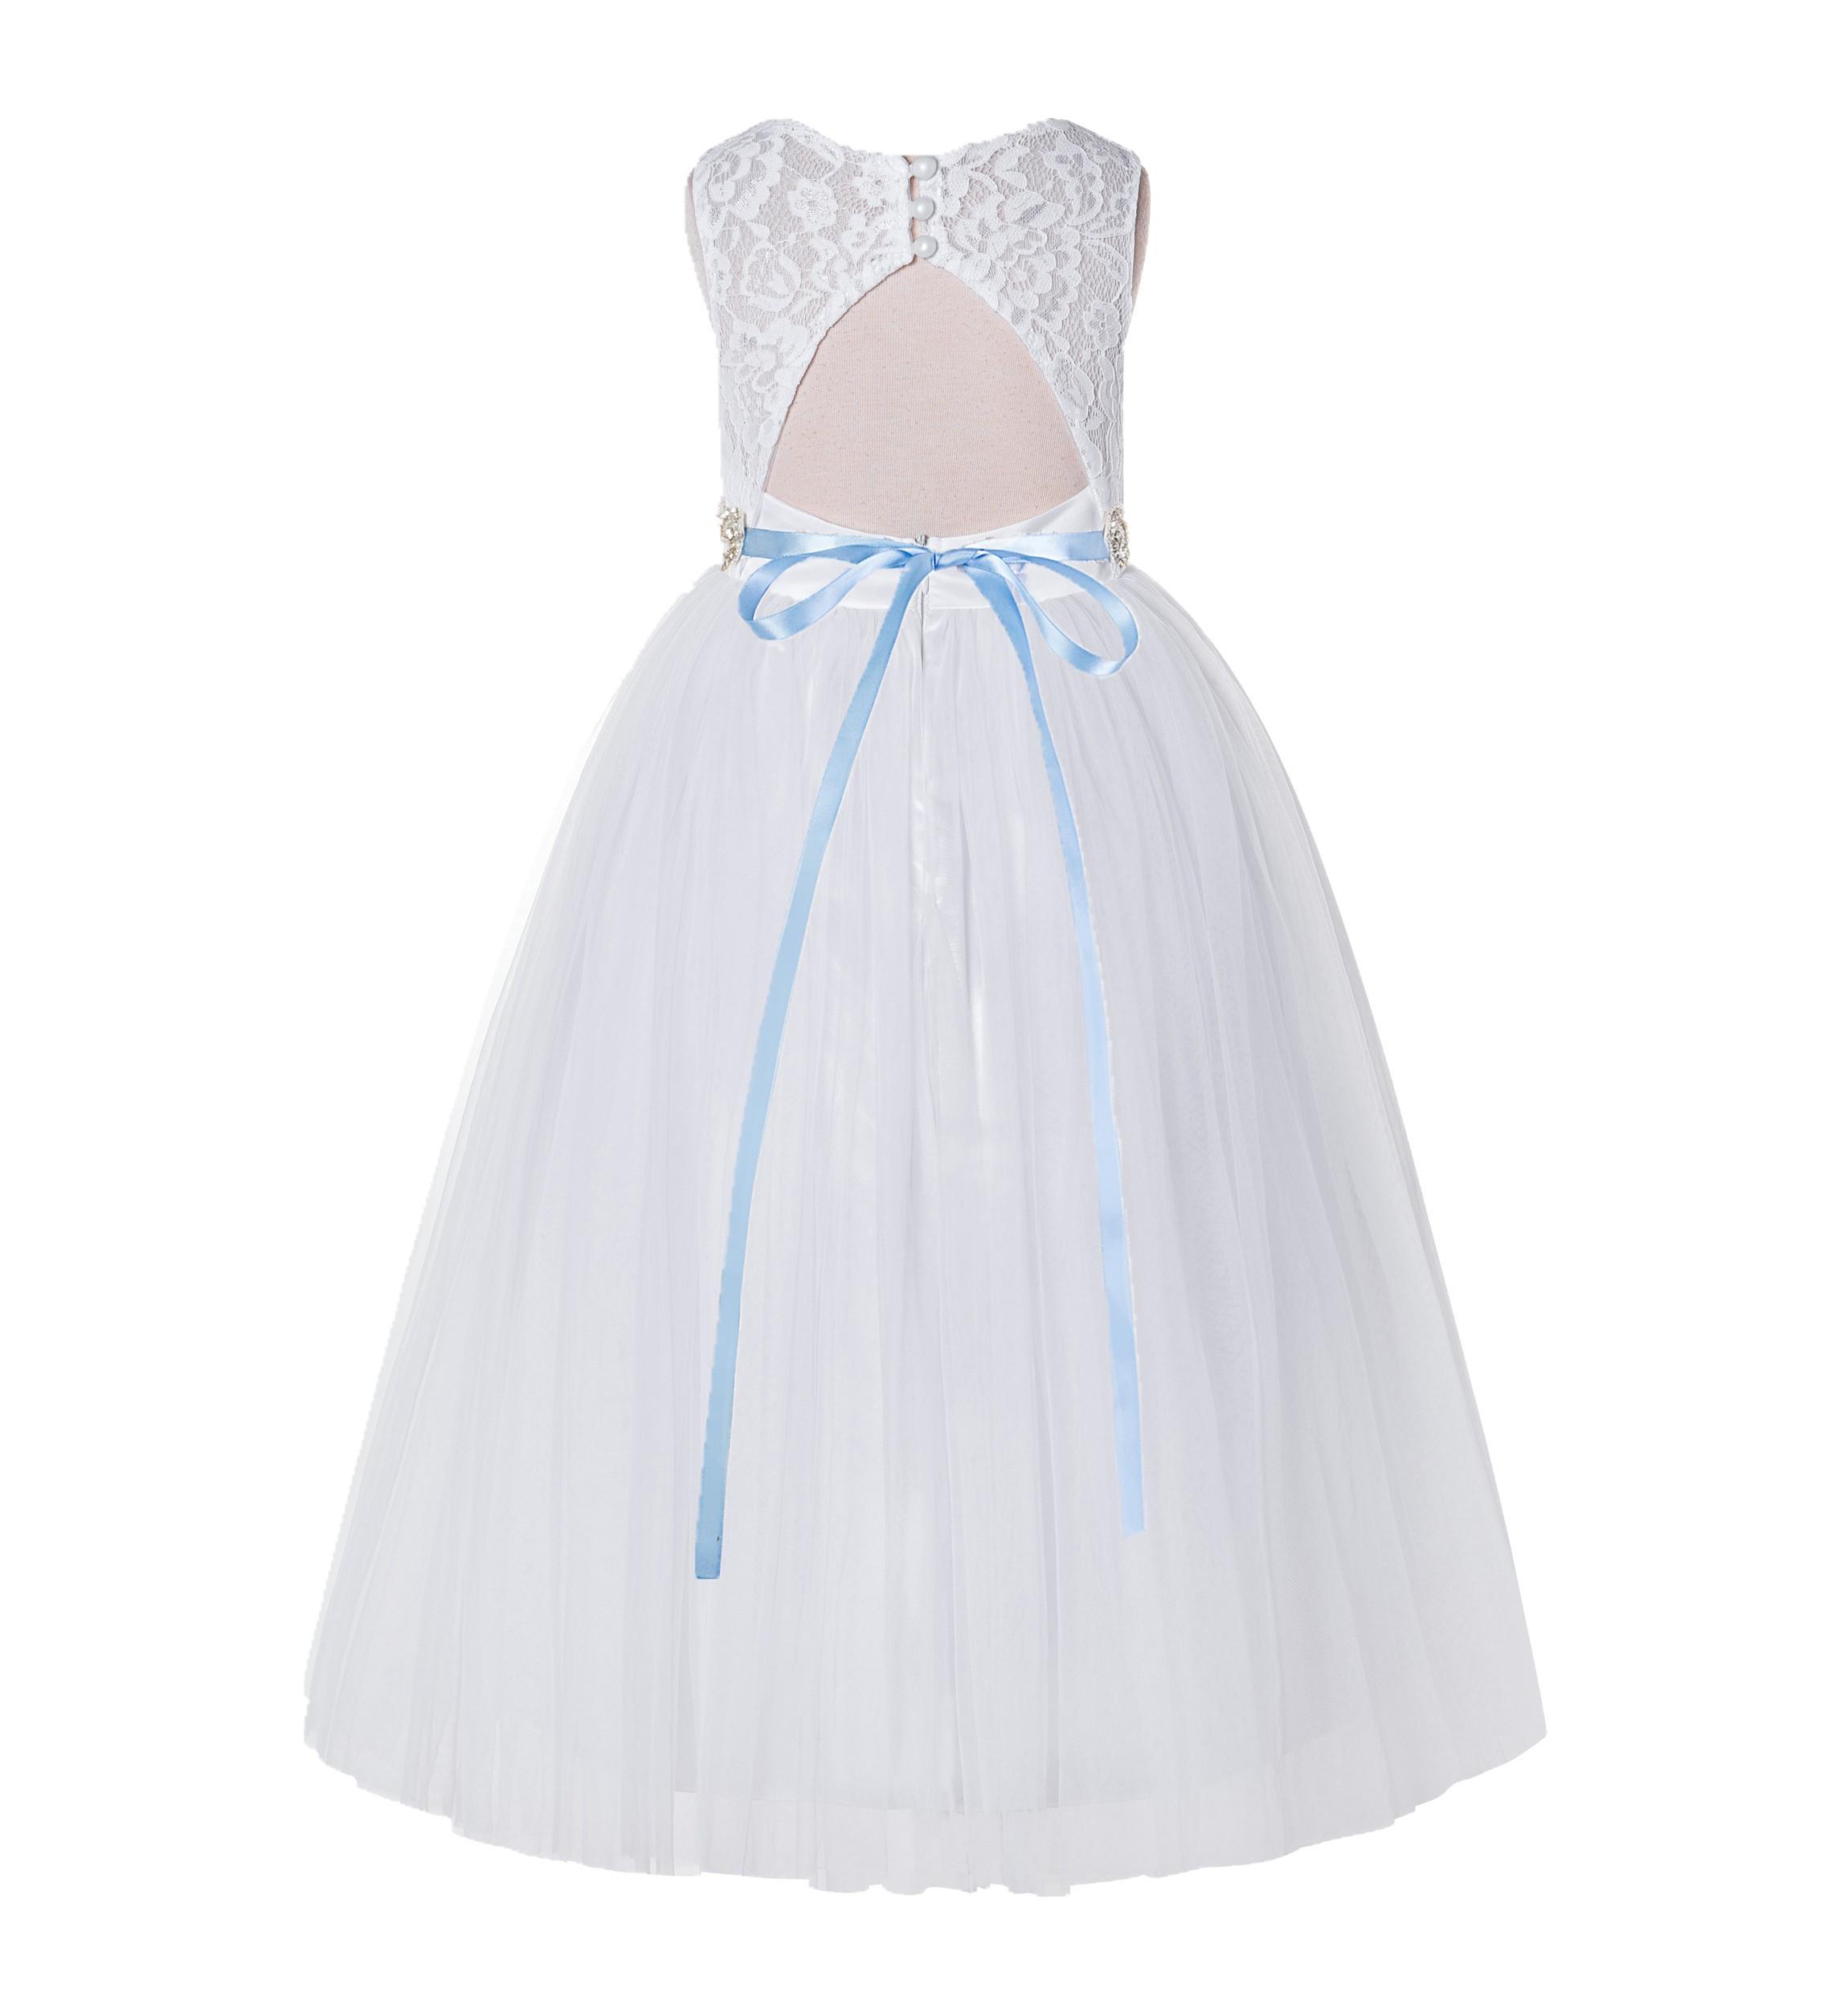 White / Dusty Blue A-Line Lace Flower Girl Dress 178R2